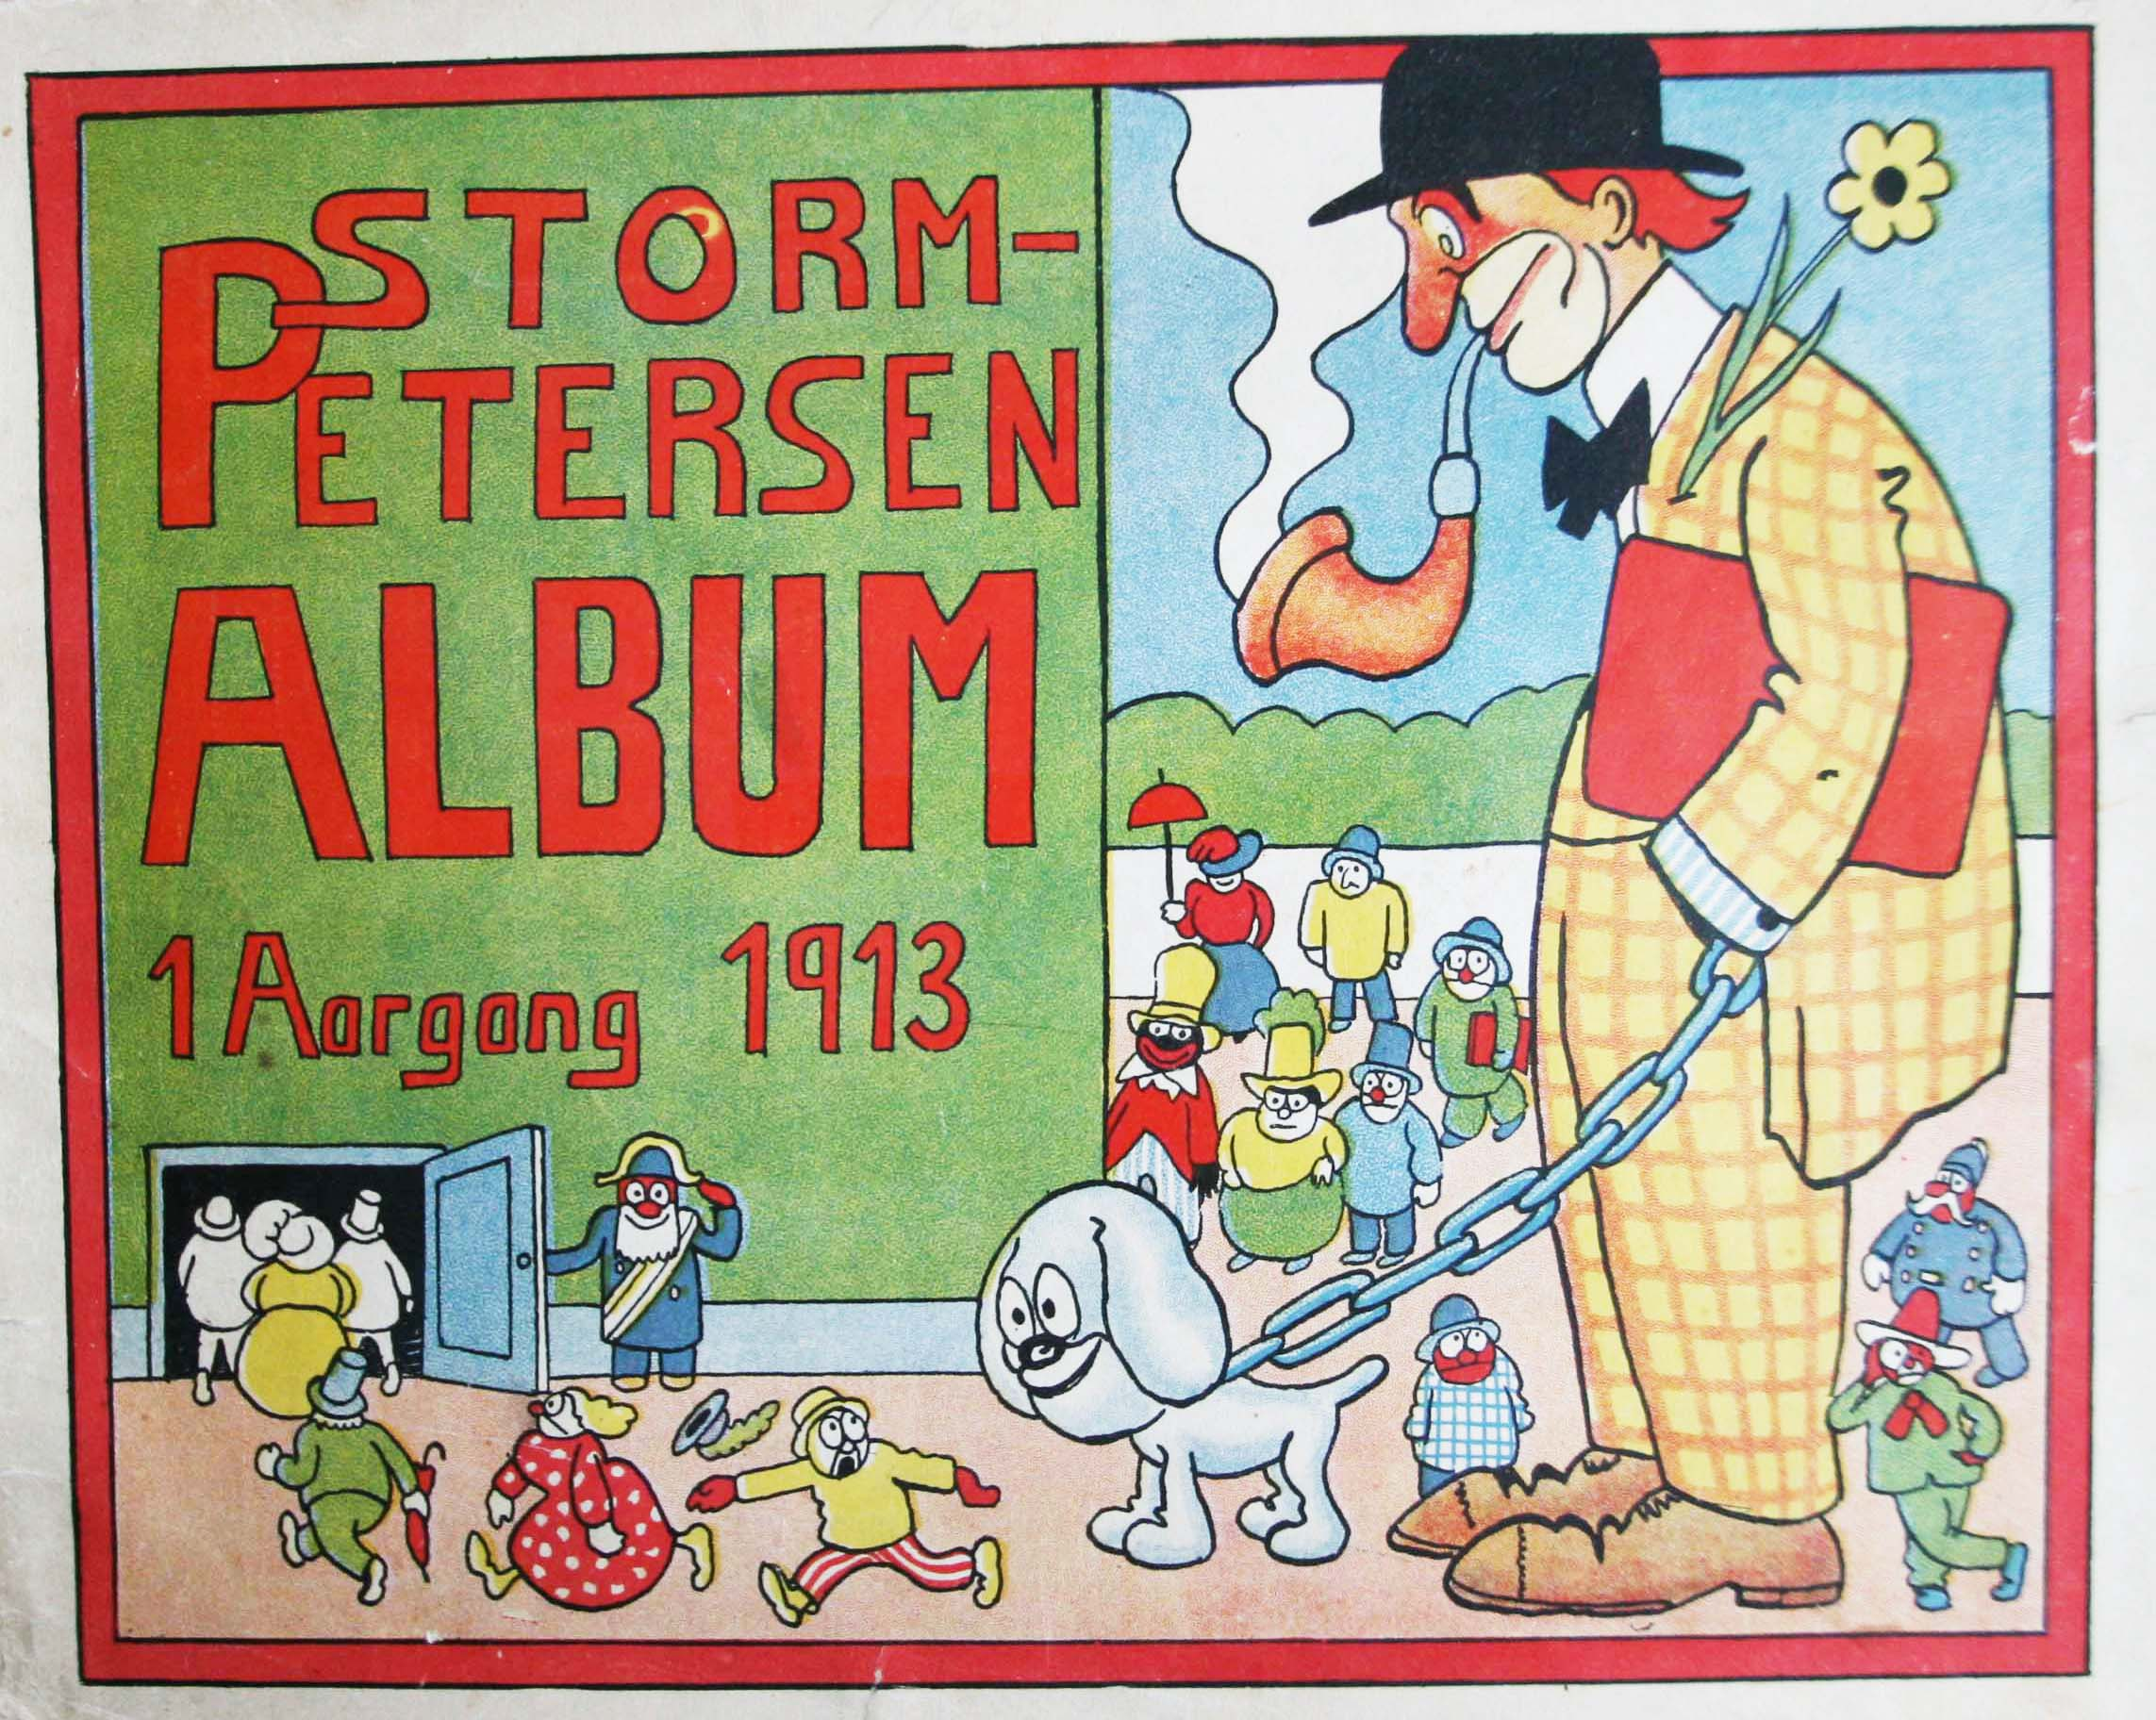 Robert Storm Petersen Storm P. Album 1913 første årgang